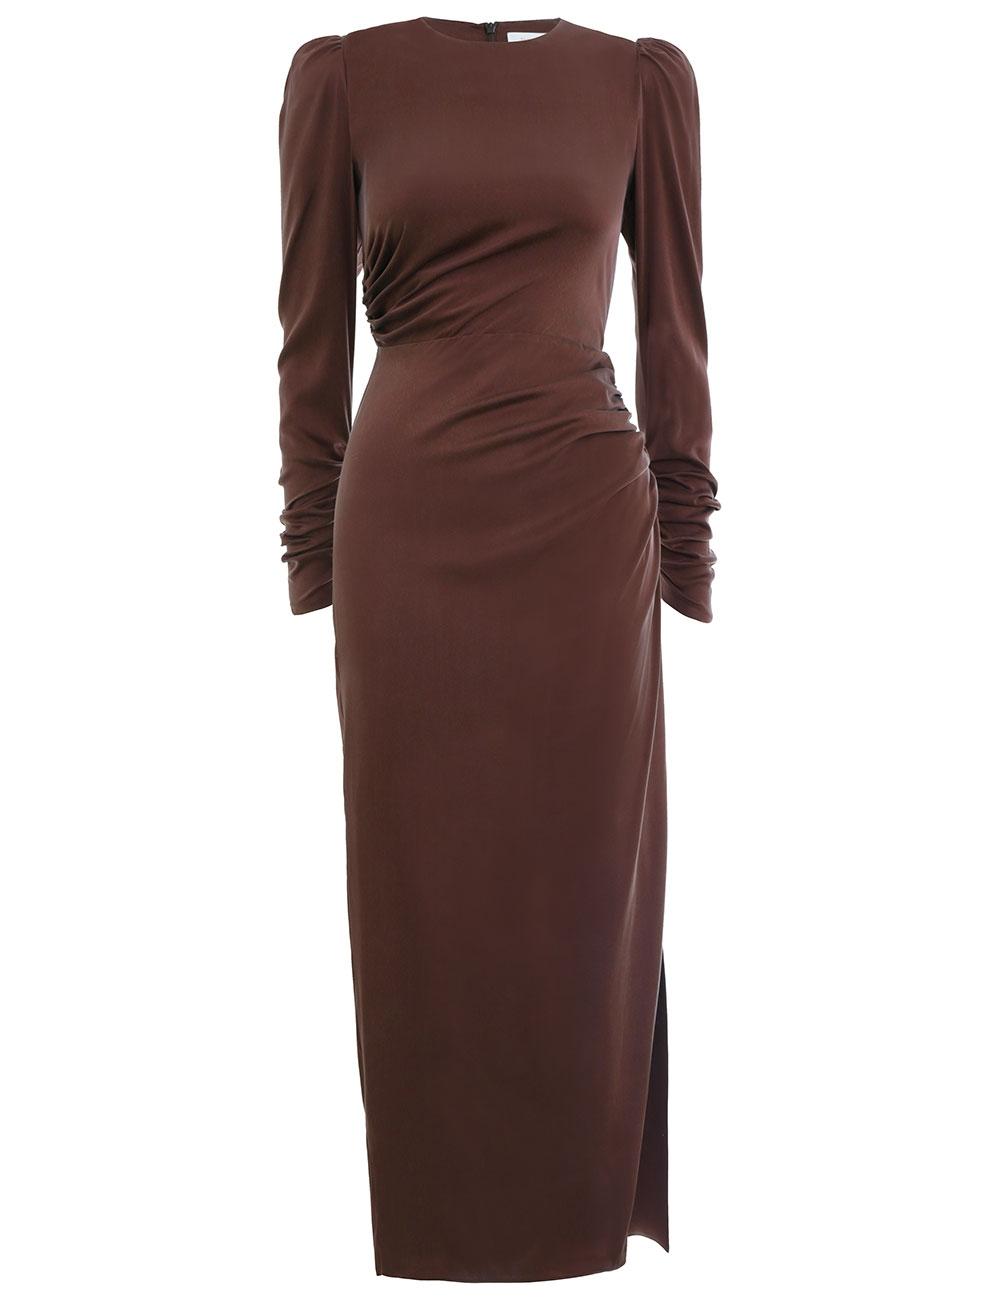 3c0b74c8cb8a Shop Designer Dresses Online   ZIMMERMANN